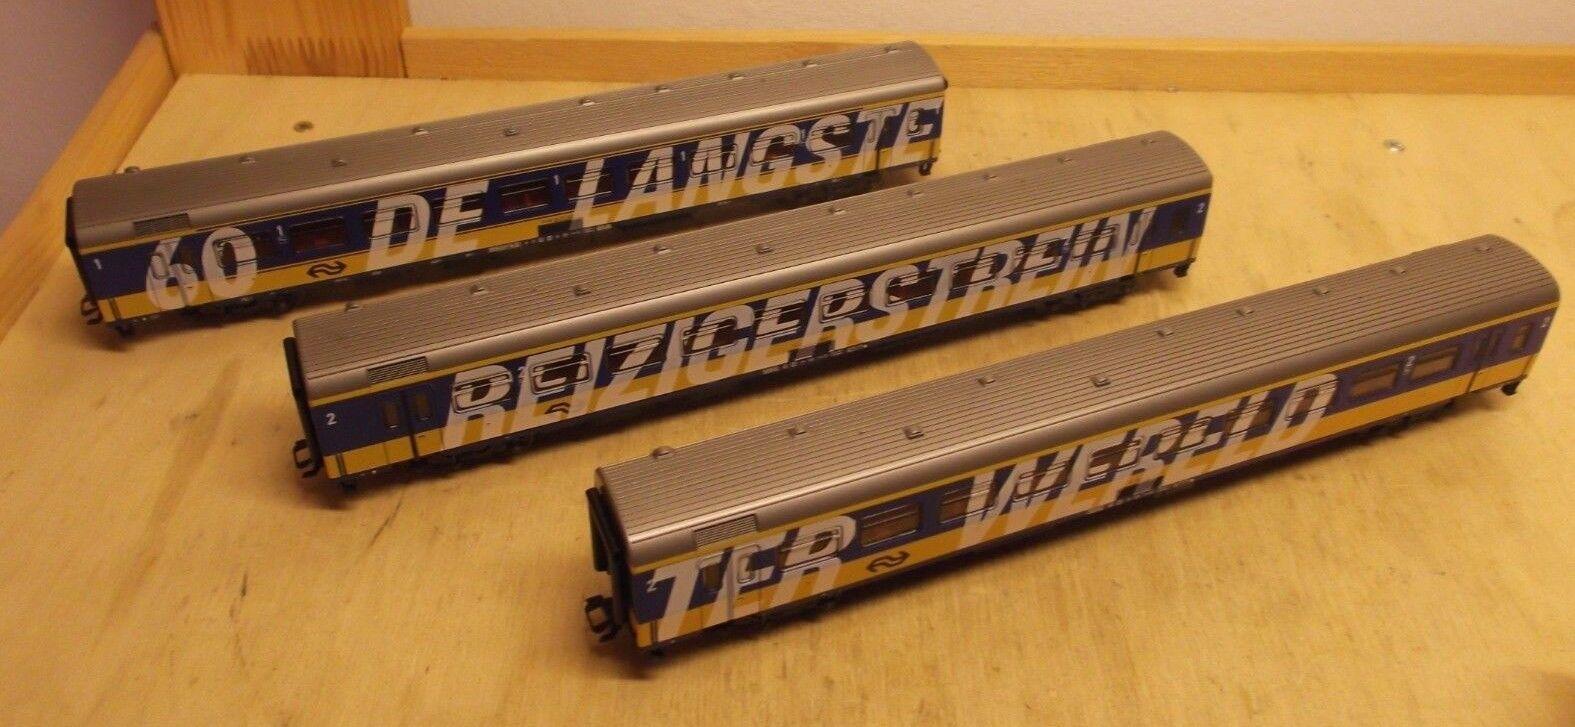 Märklin H0 4391 Car Set   the Longest Passenger Train of World   3 Ic Venture NS